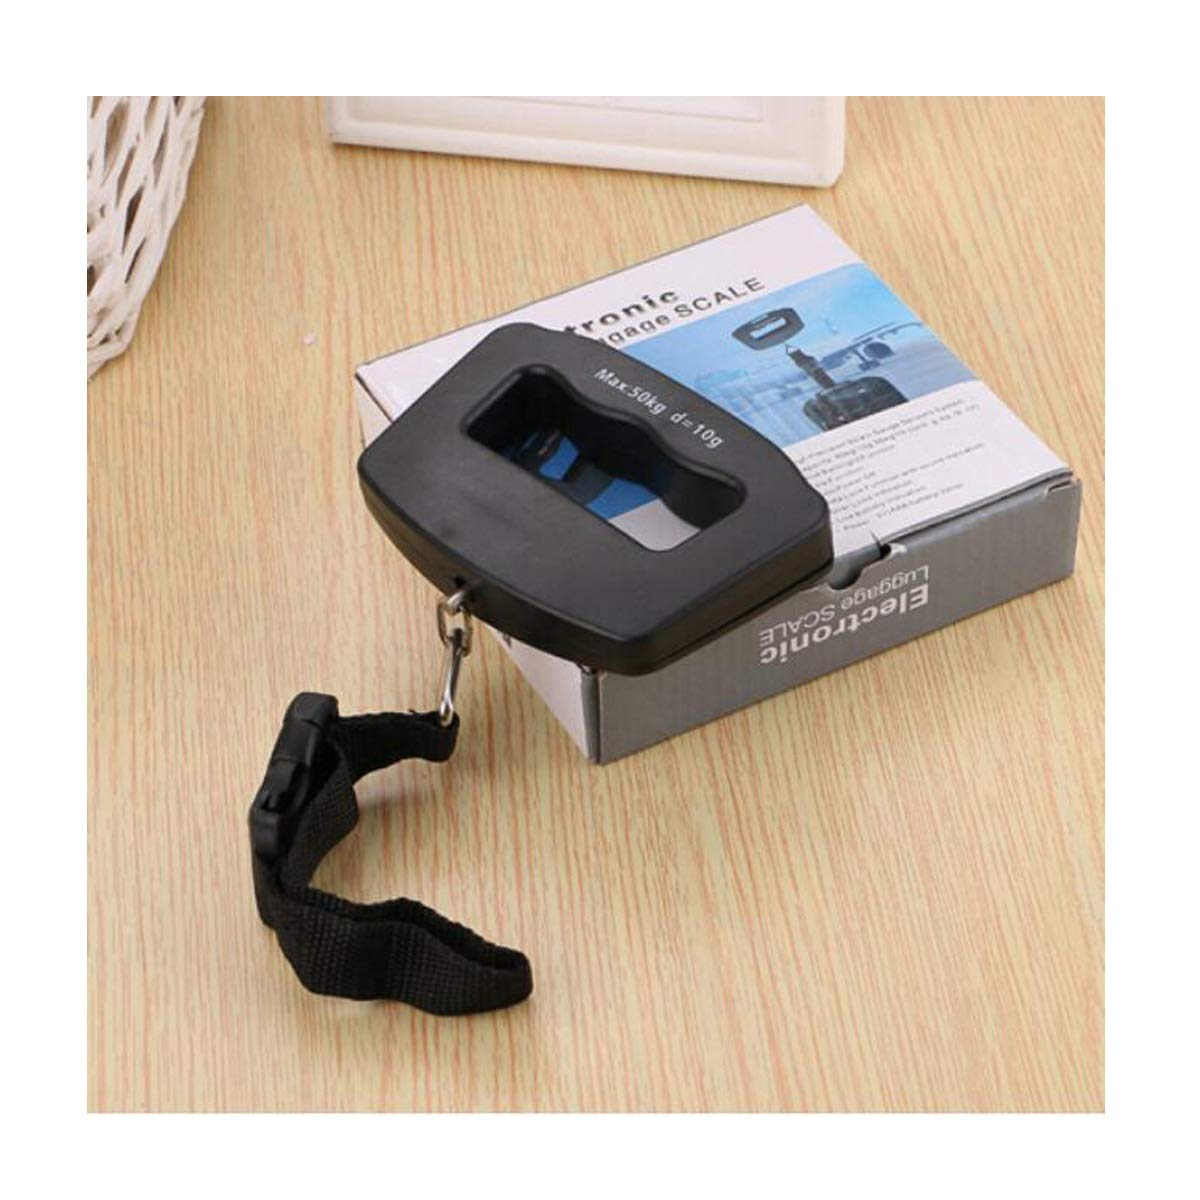 Kaiyitong Electronic Scales, Portable Portable Electronic Scales, Portable Fishing Hand Luggage Scales (Color : Black)